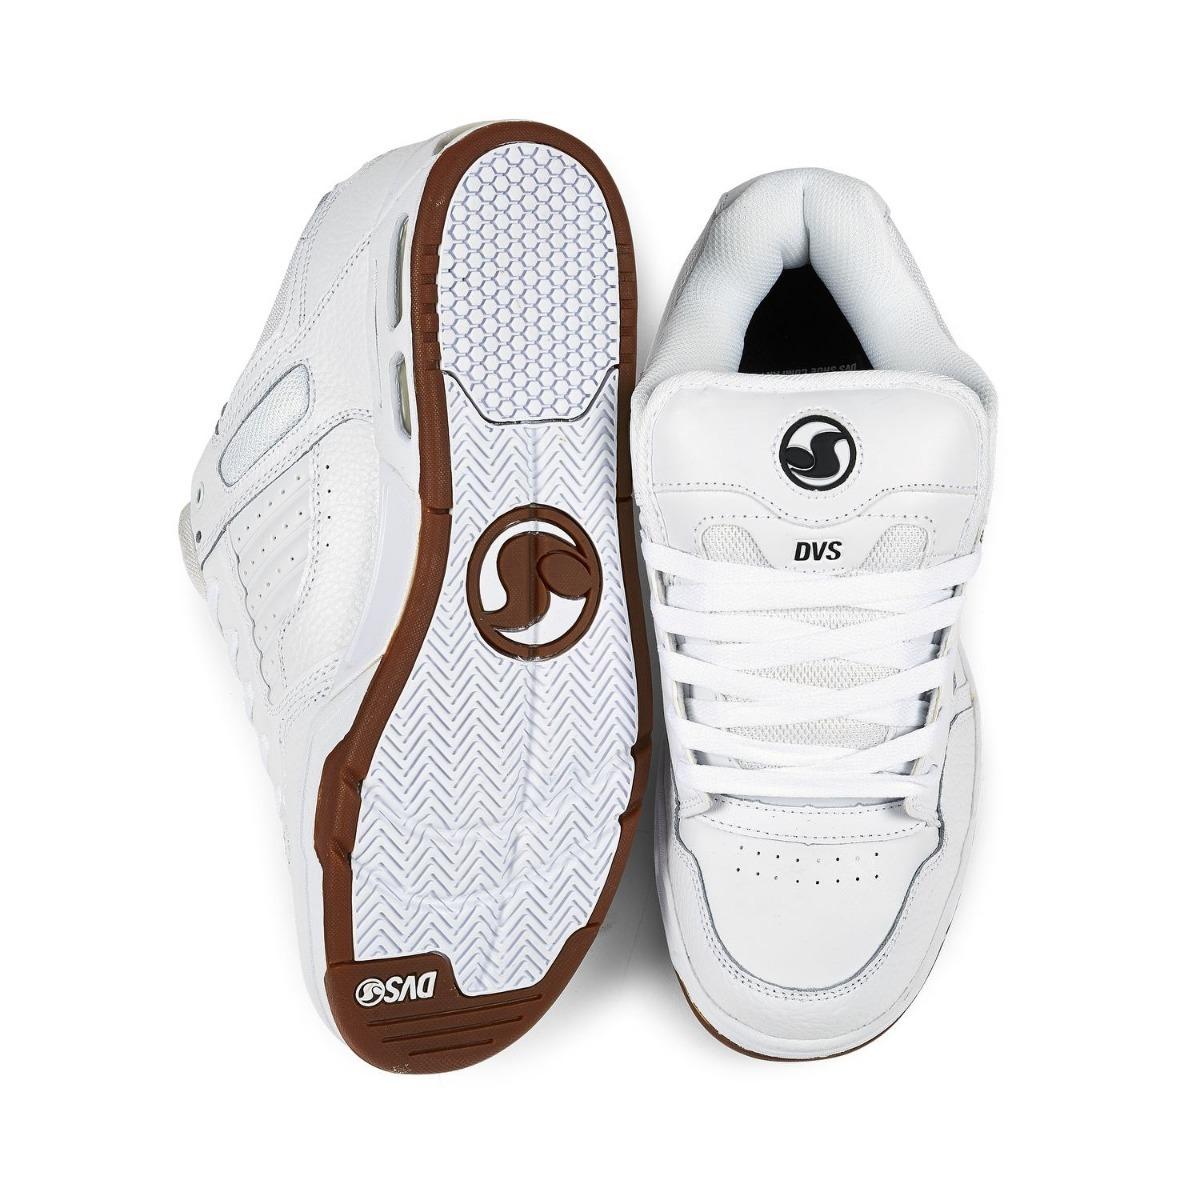 ee7ba9db68f tênis dvs enduro heir white gum classic skate. Carregando zoom.